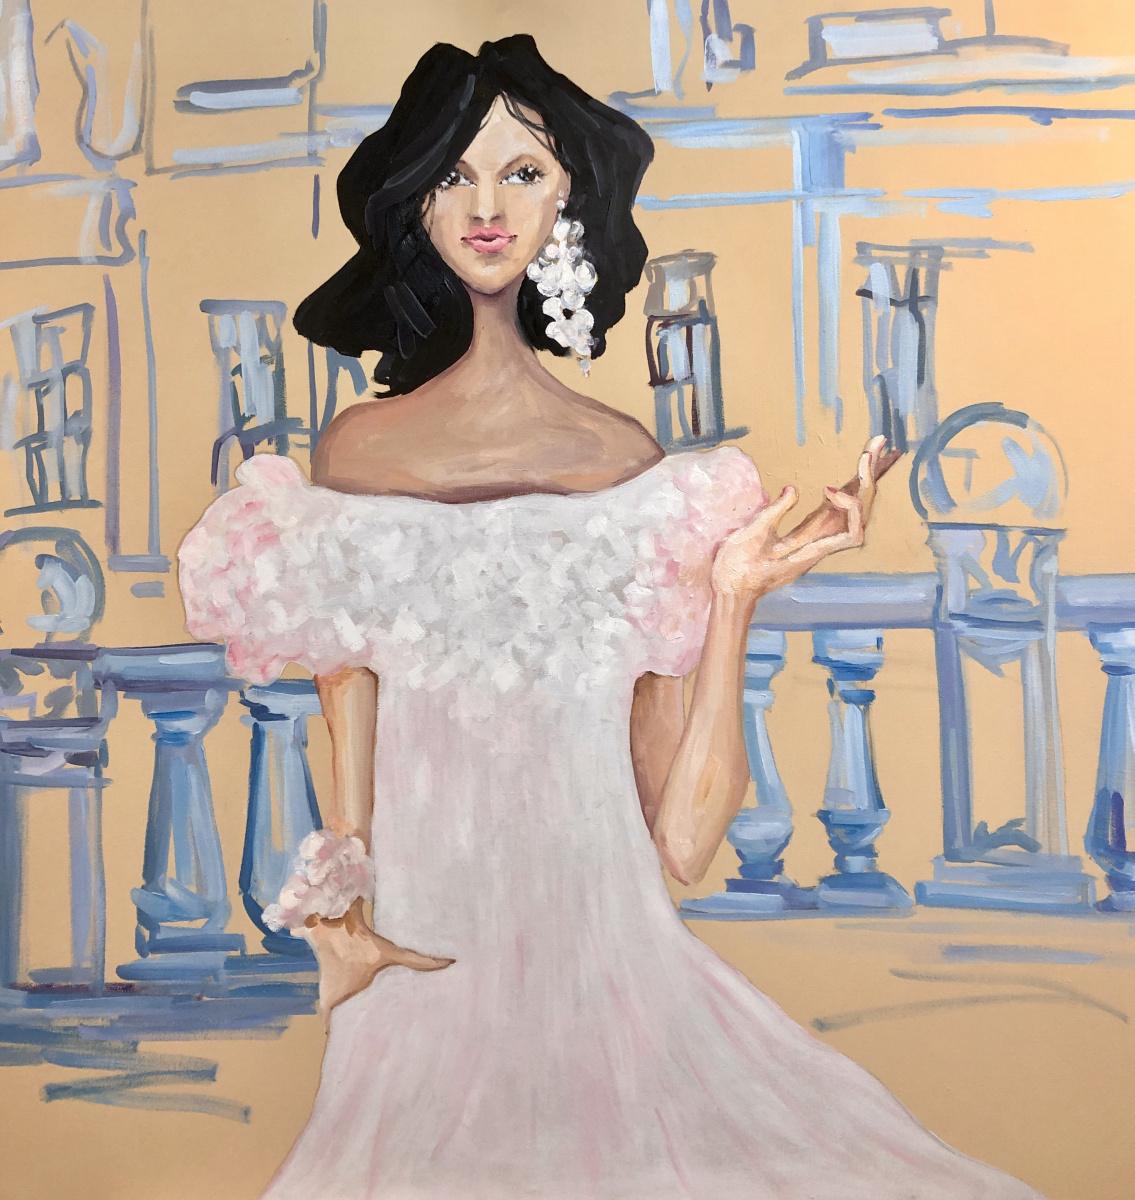 Natalia Shlyakhova. Girl in white dress